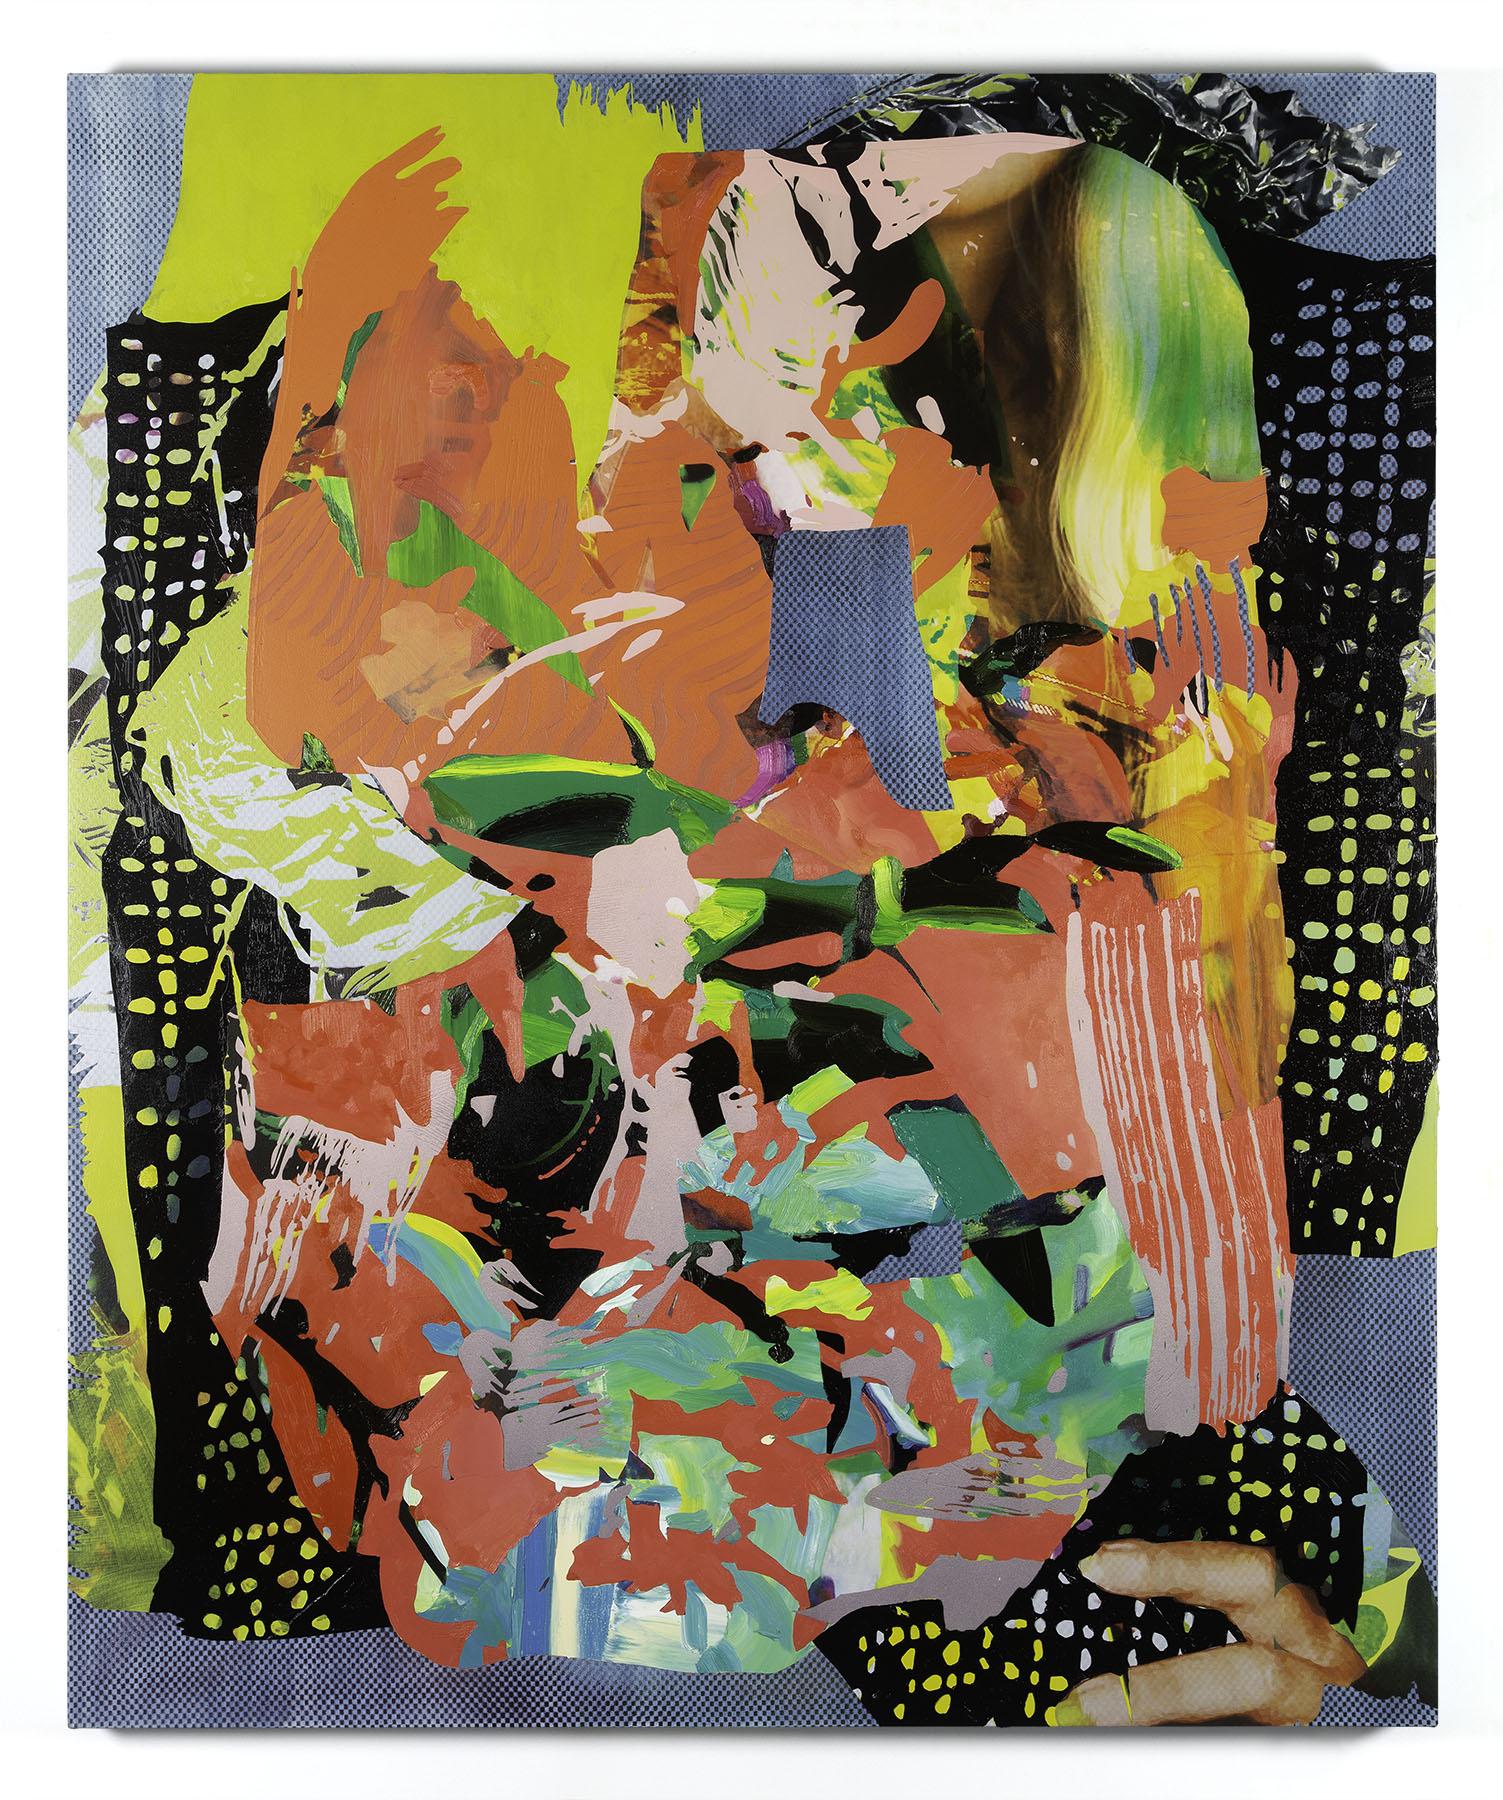 Jimmy Baker, American artist, painting, digital printing : Burden of Being (to Richard and Elizabeth)